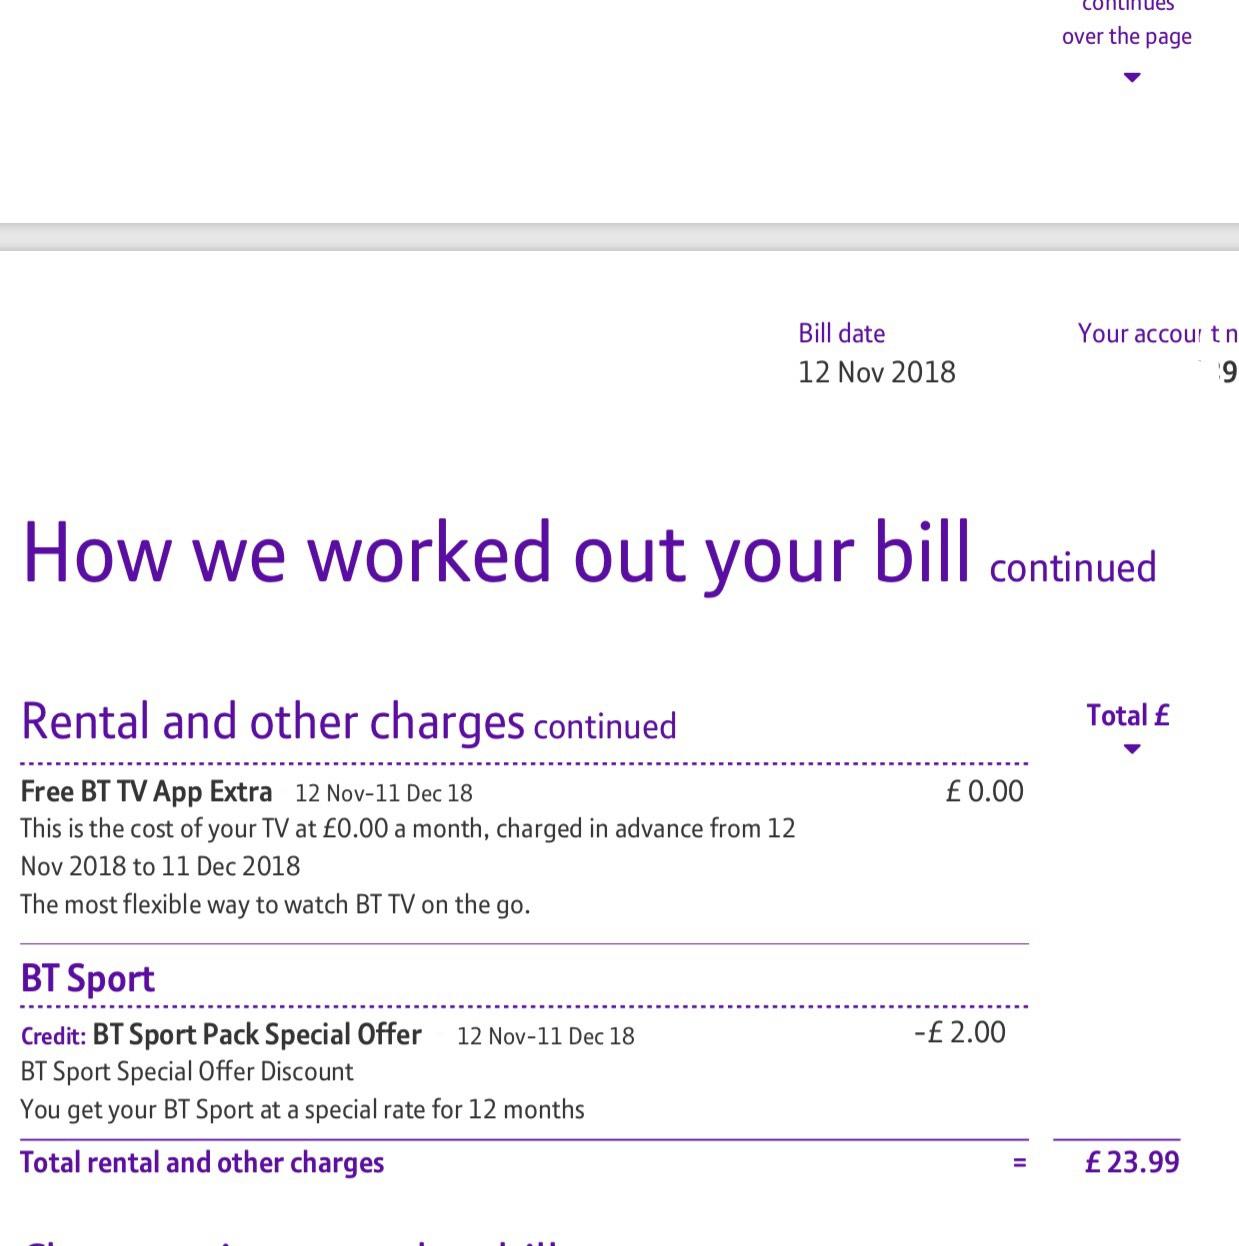 Retention deal - BT Fibre 1 broadband with BT Sport Line rental for telephone Unlimited weekend calls £23.99